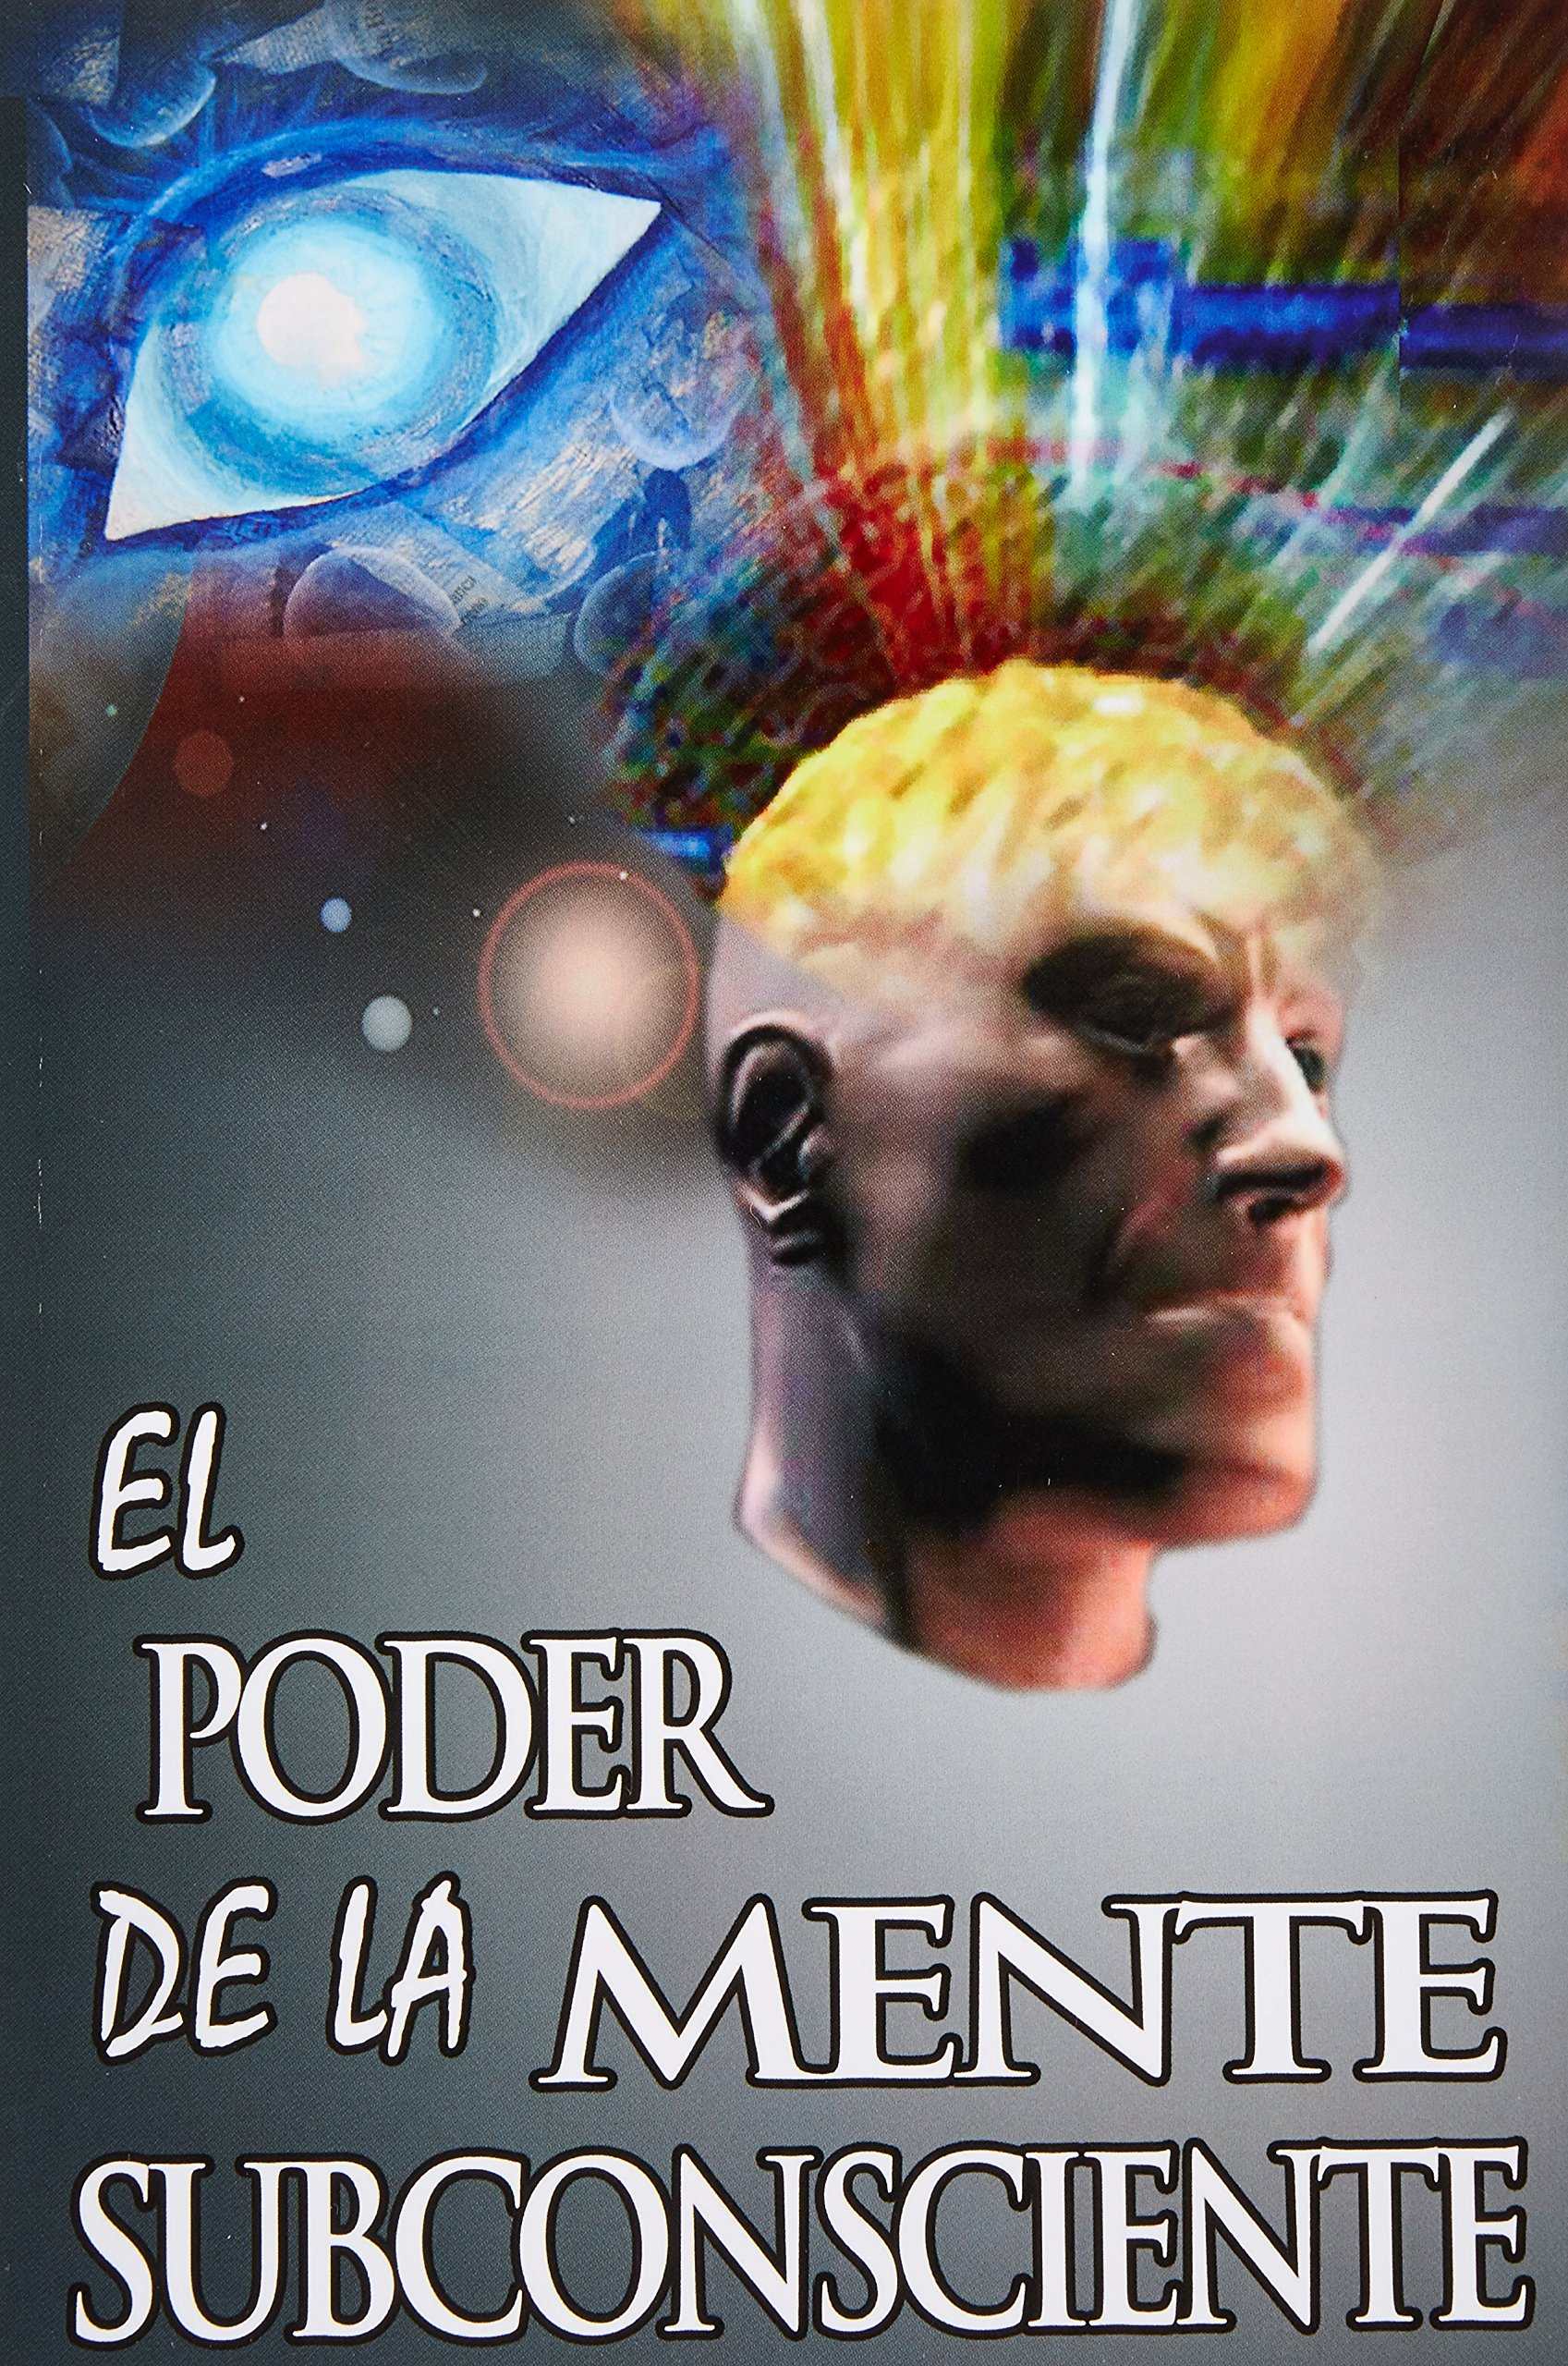 Poder Mente Subconsciente Subconscious Spanish product image